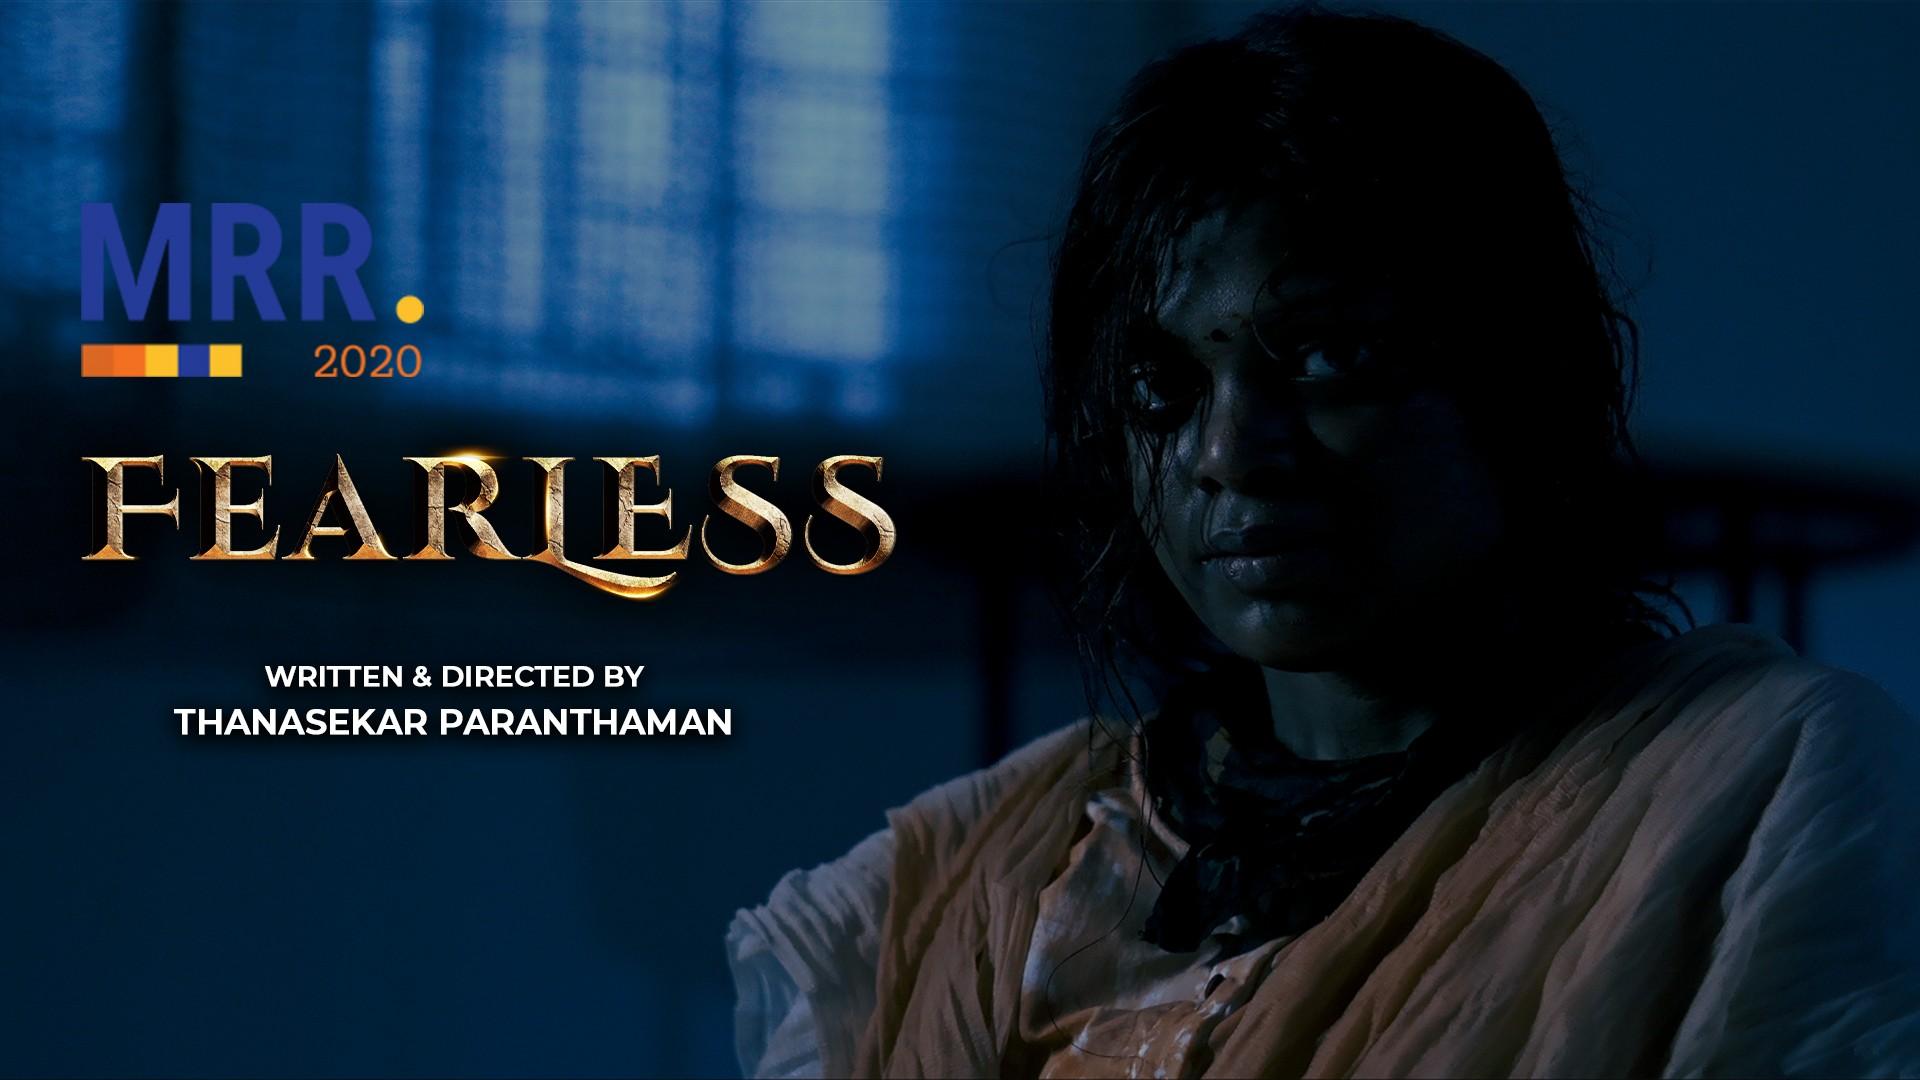 FEARLESS (4K) | My RØDE Reel 2020 | Thanasekar Paranthaman